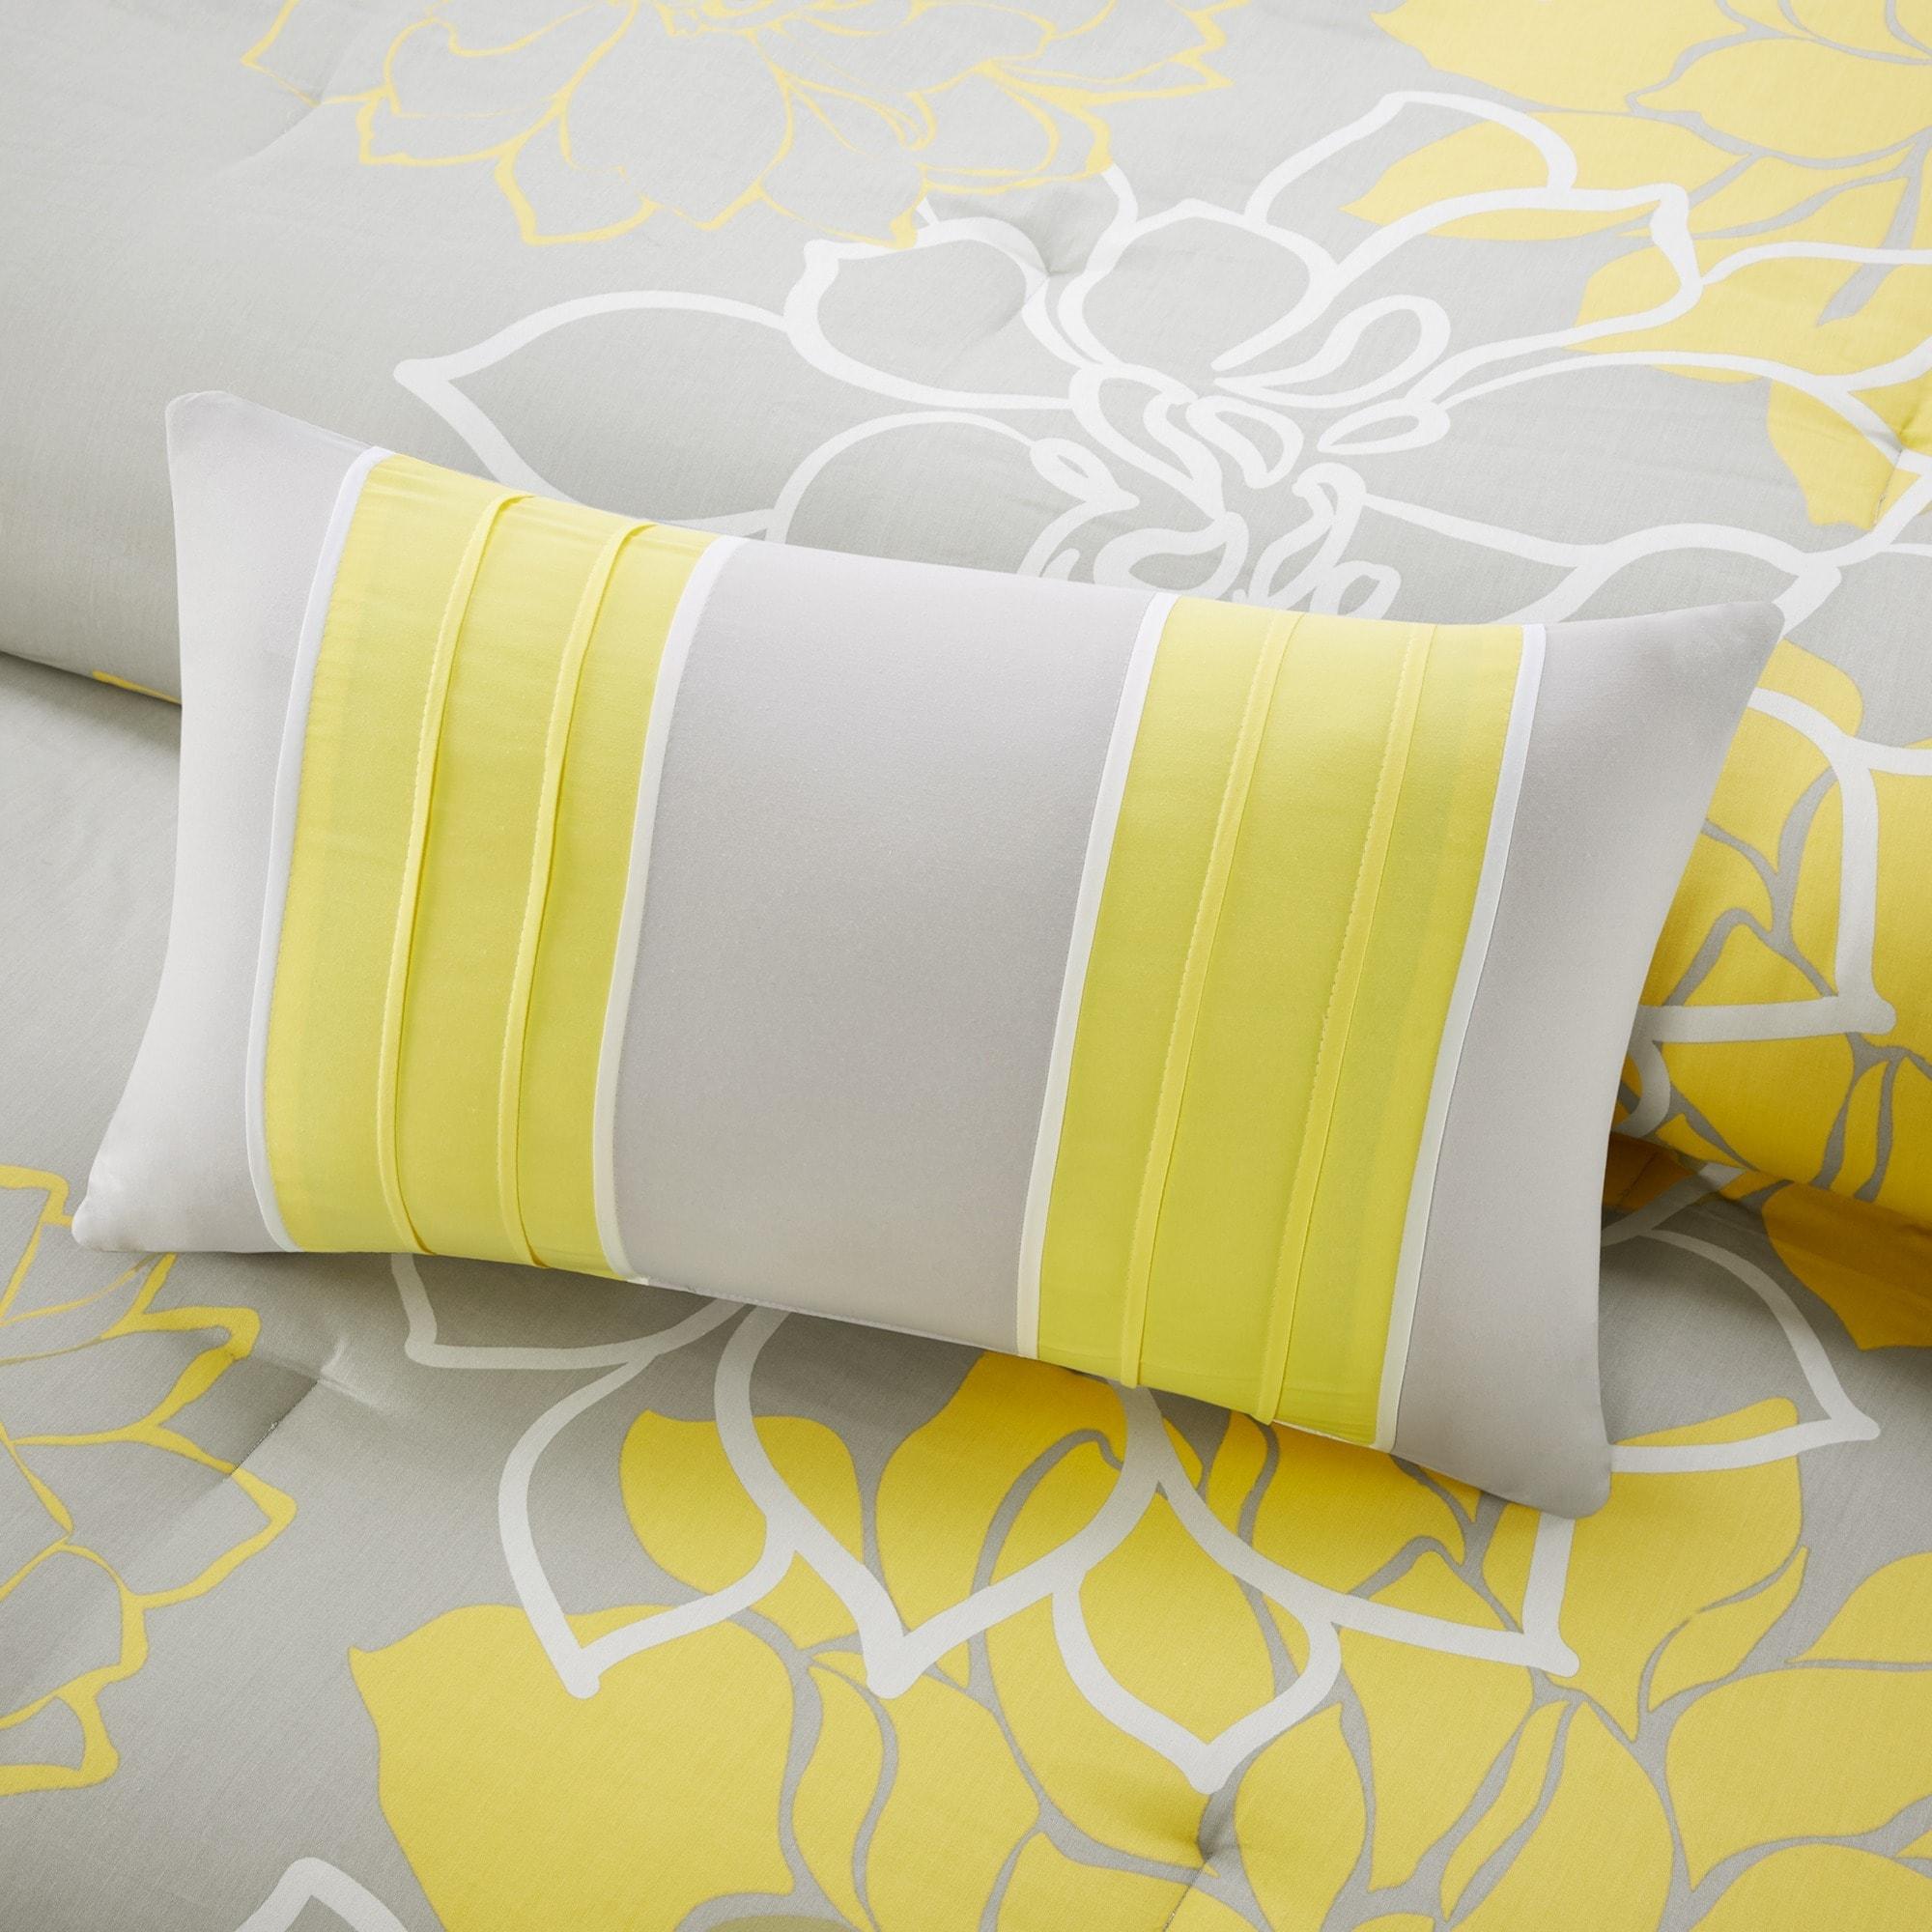 duvet bedding grey and pin pillow dot yellow polka cover cases set